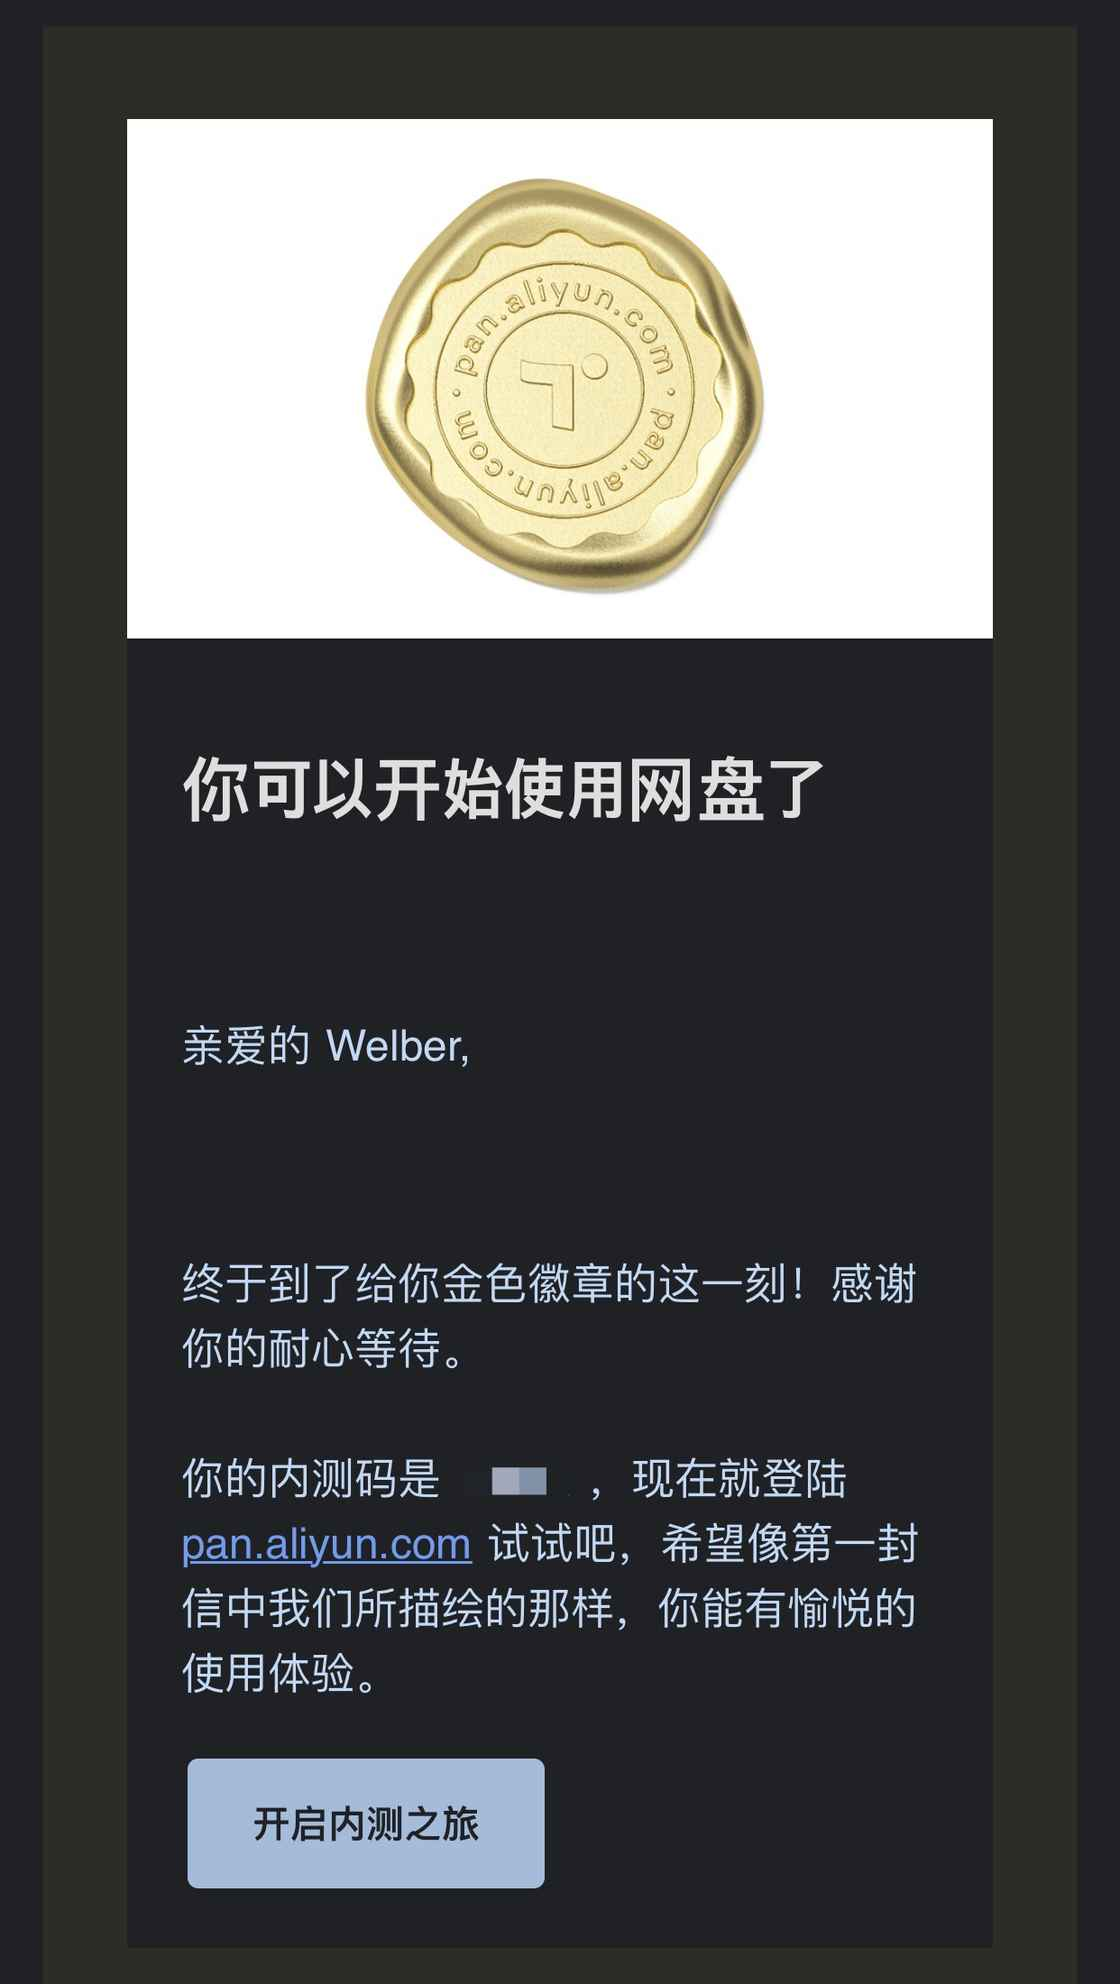 Teambition 的网盘内测码邮件,金色徽章代表已经获得内测资格